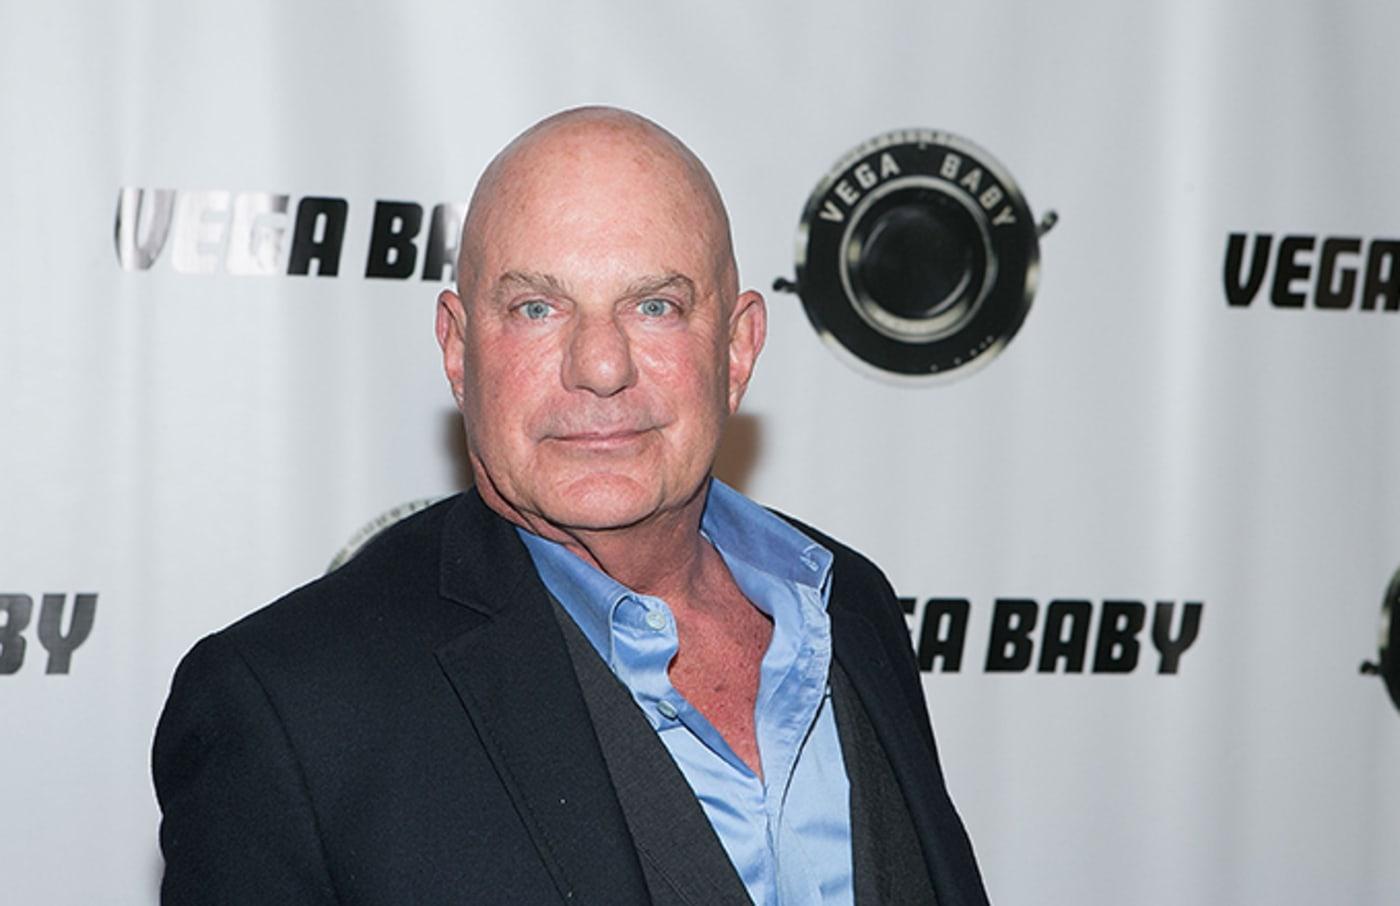 Director Rob Cohen